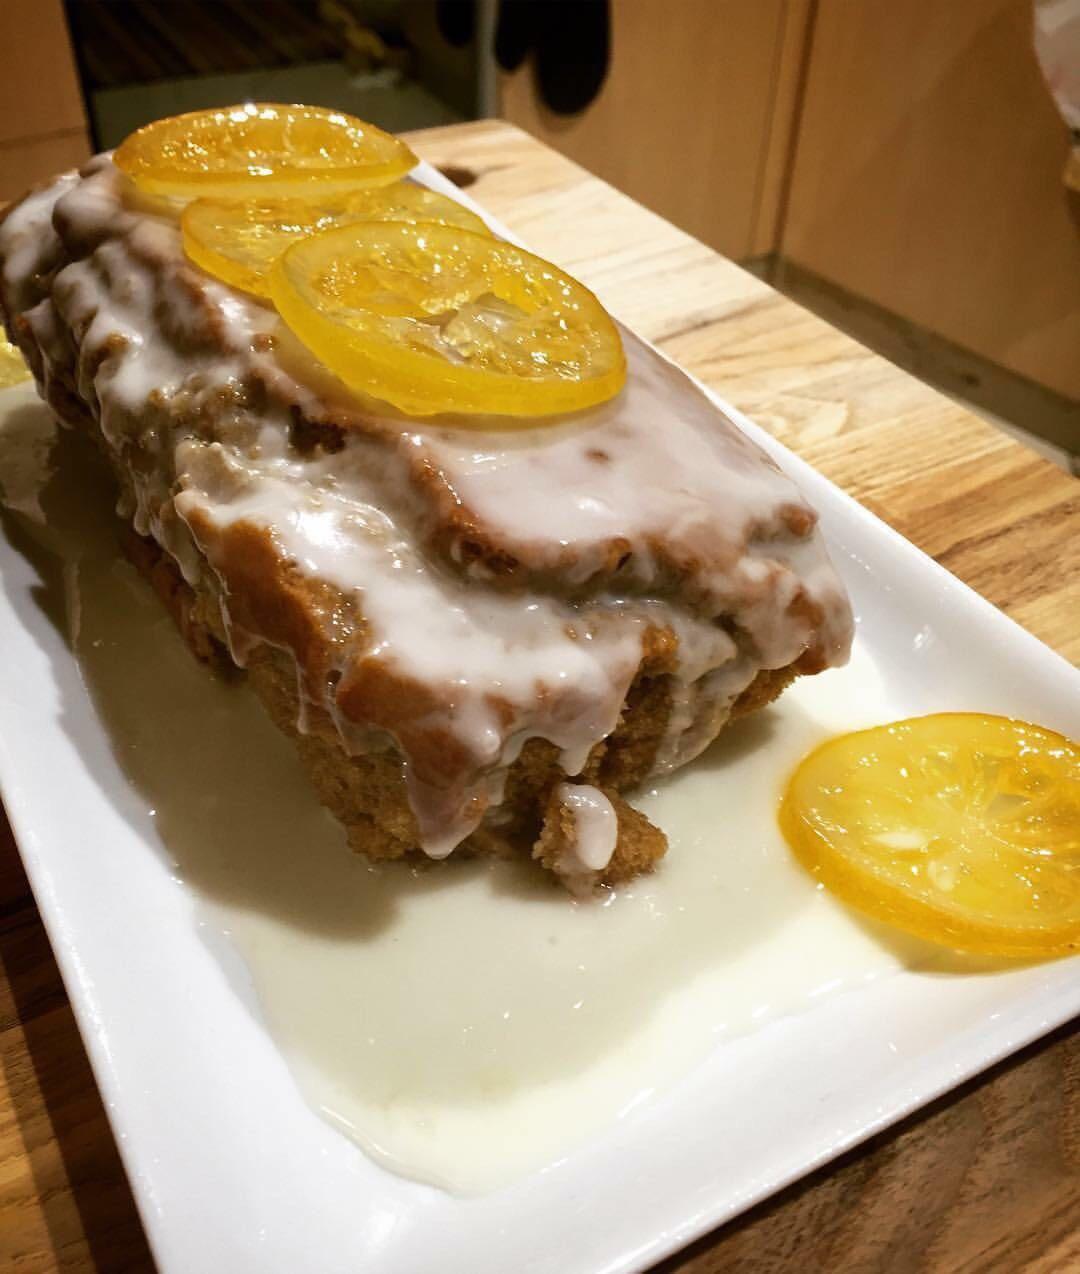 Vegan recipe dessert lemon banana cake lent fasting vegan healthy living healthy dessert sweet treat recipe blog dubai blogger uae paul estorffe